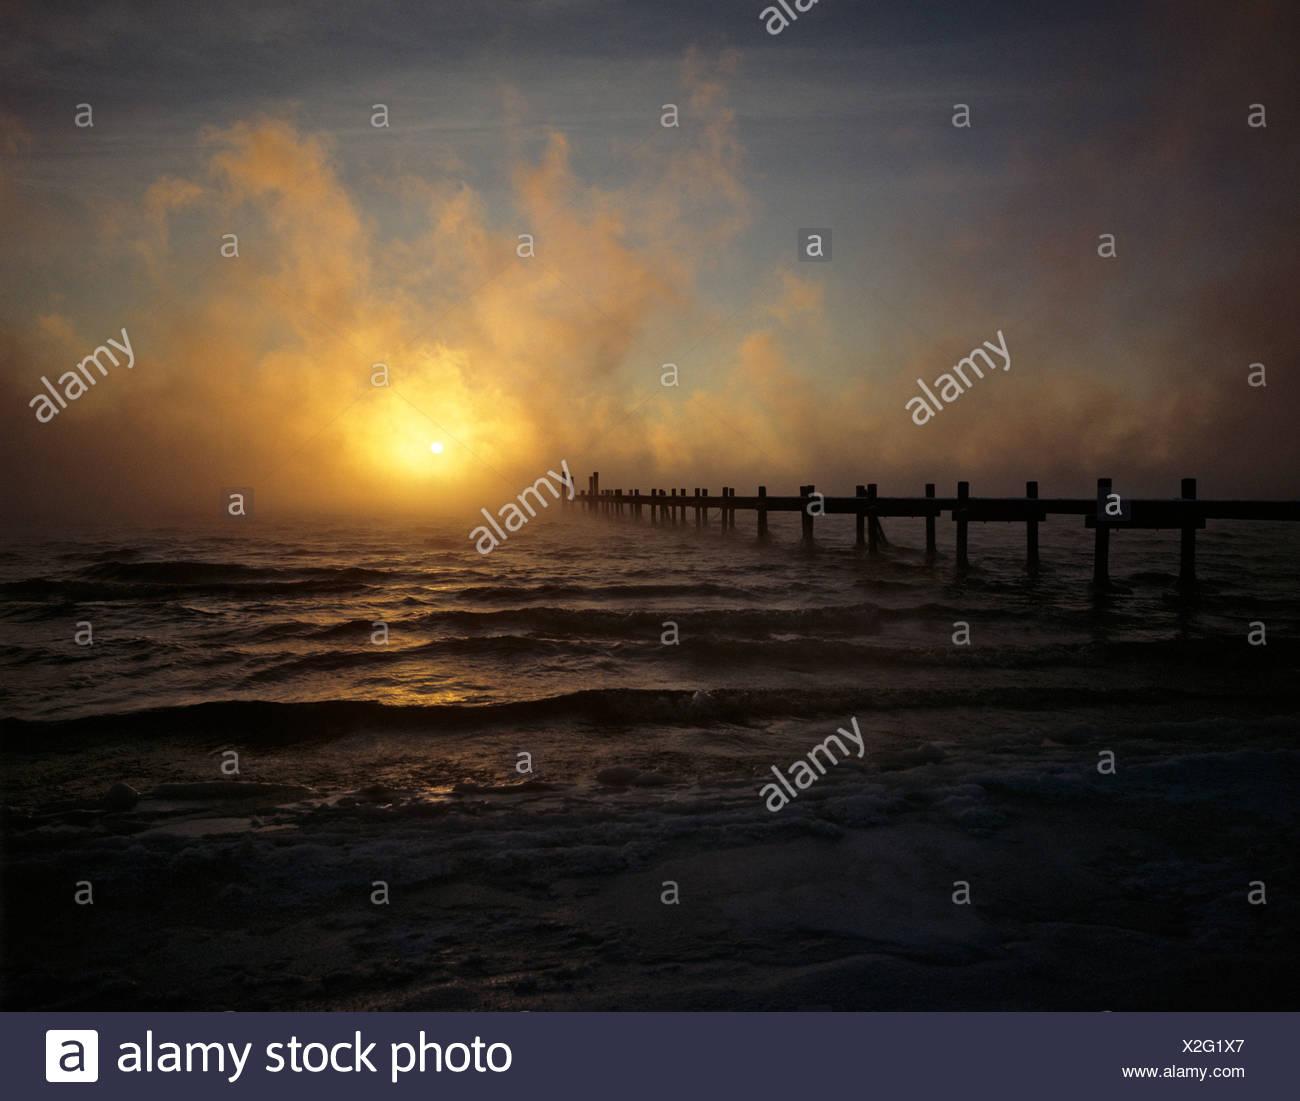 Sunset, waft of mist, Lake Chiemsee, Bavaria, Germany - Stock Image